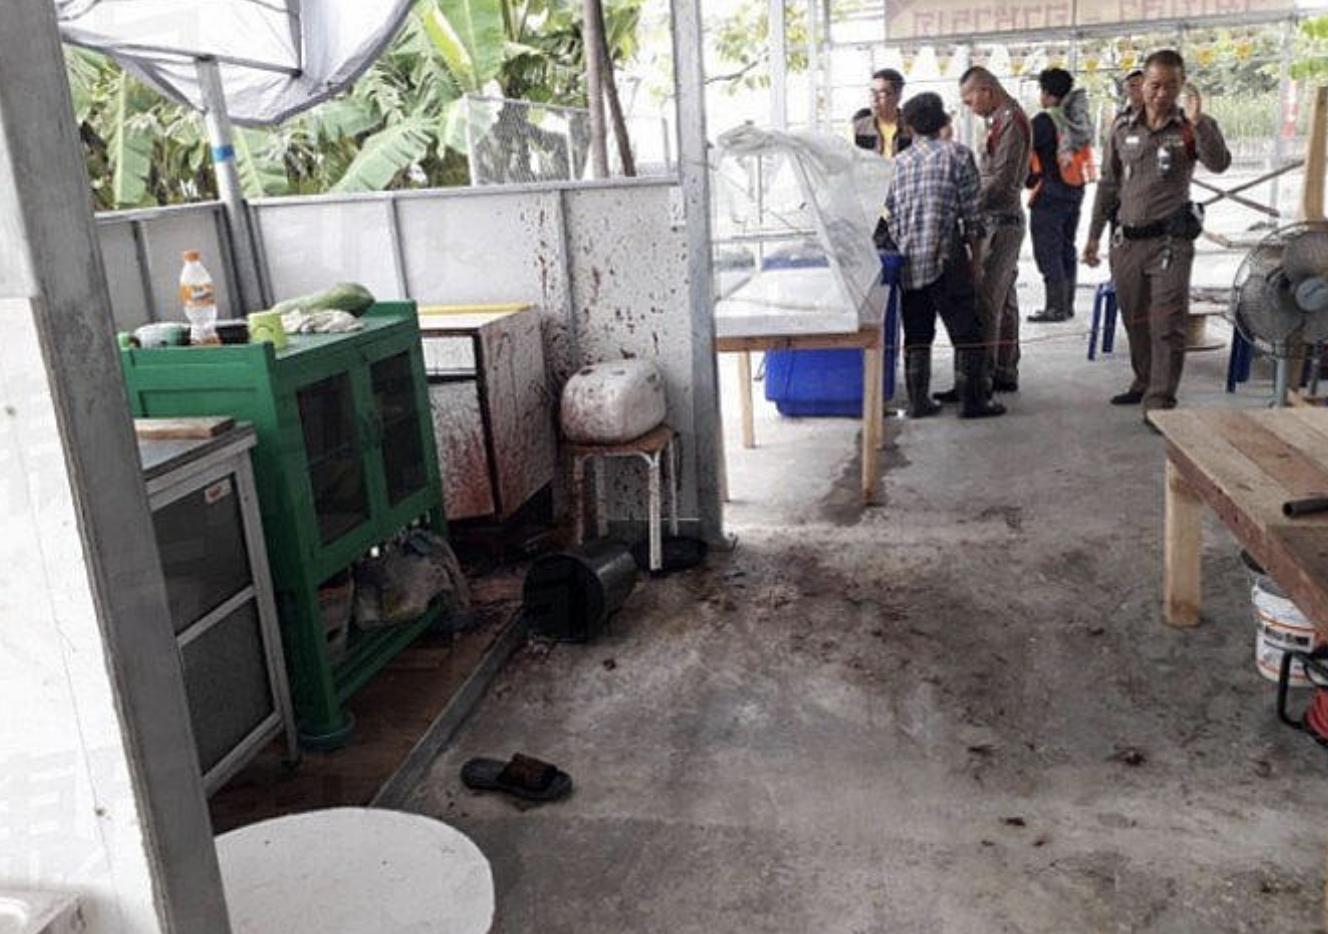 Ningún restaurante vegetariano tailandés fue clausurado por servir carne humana